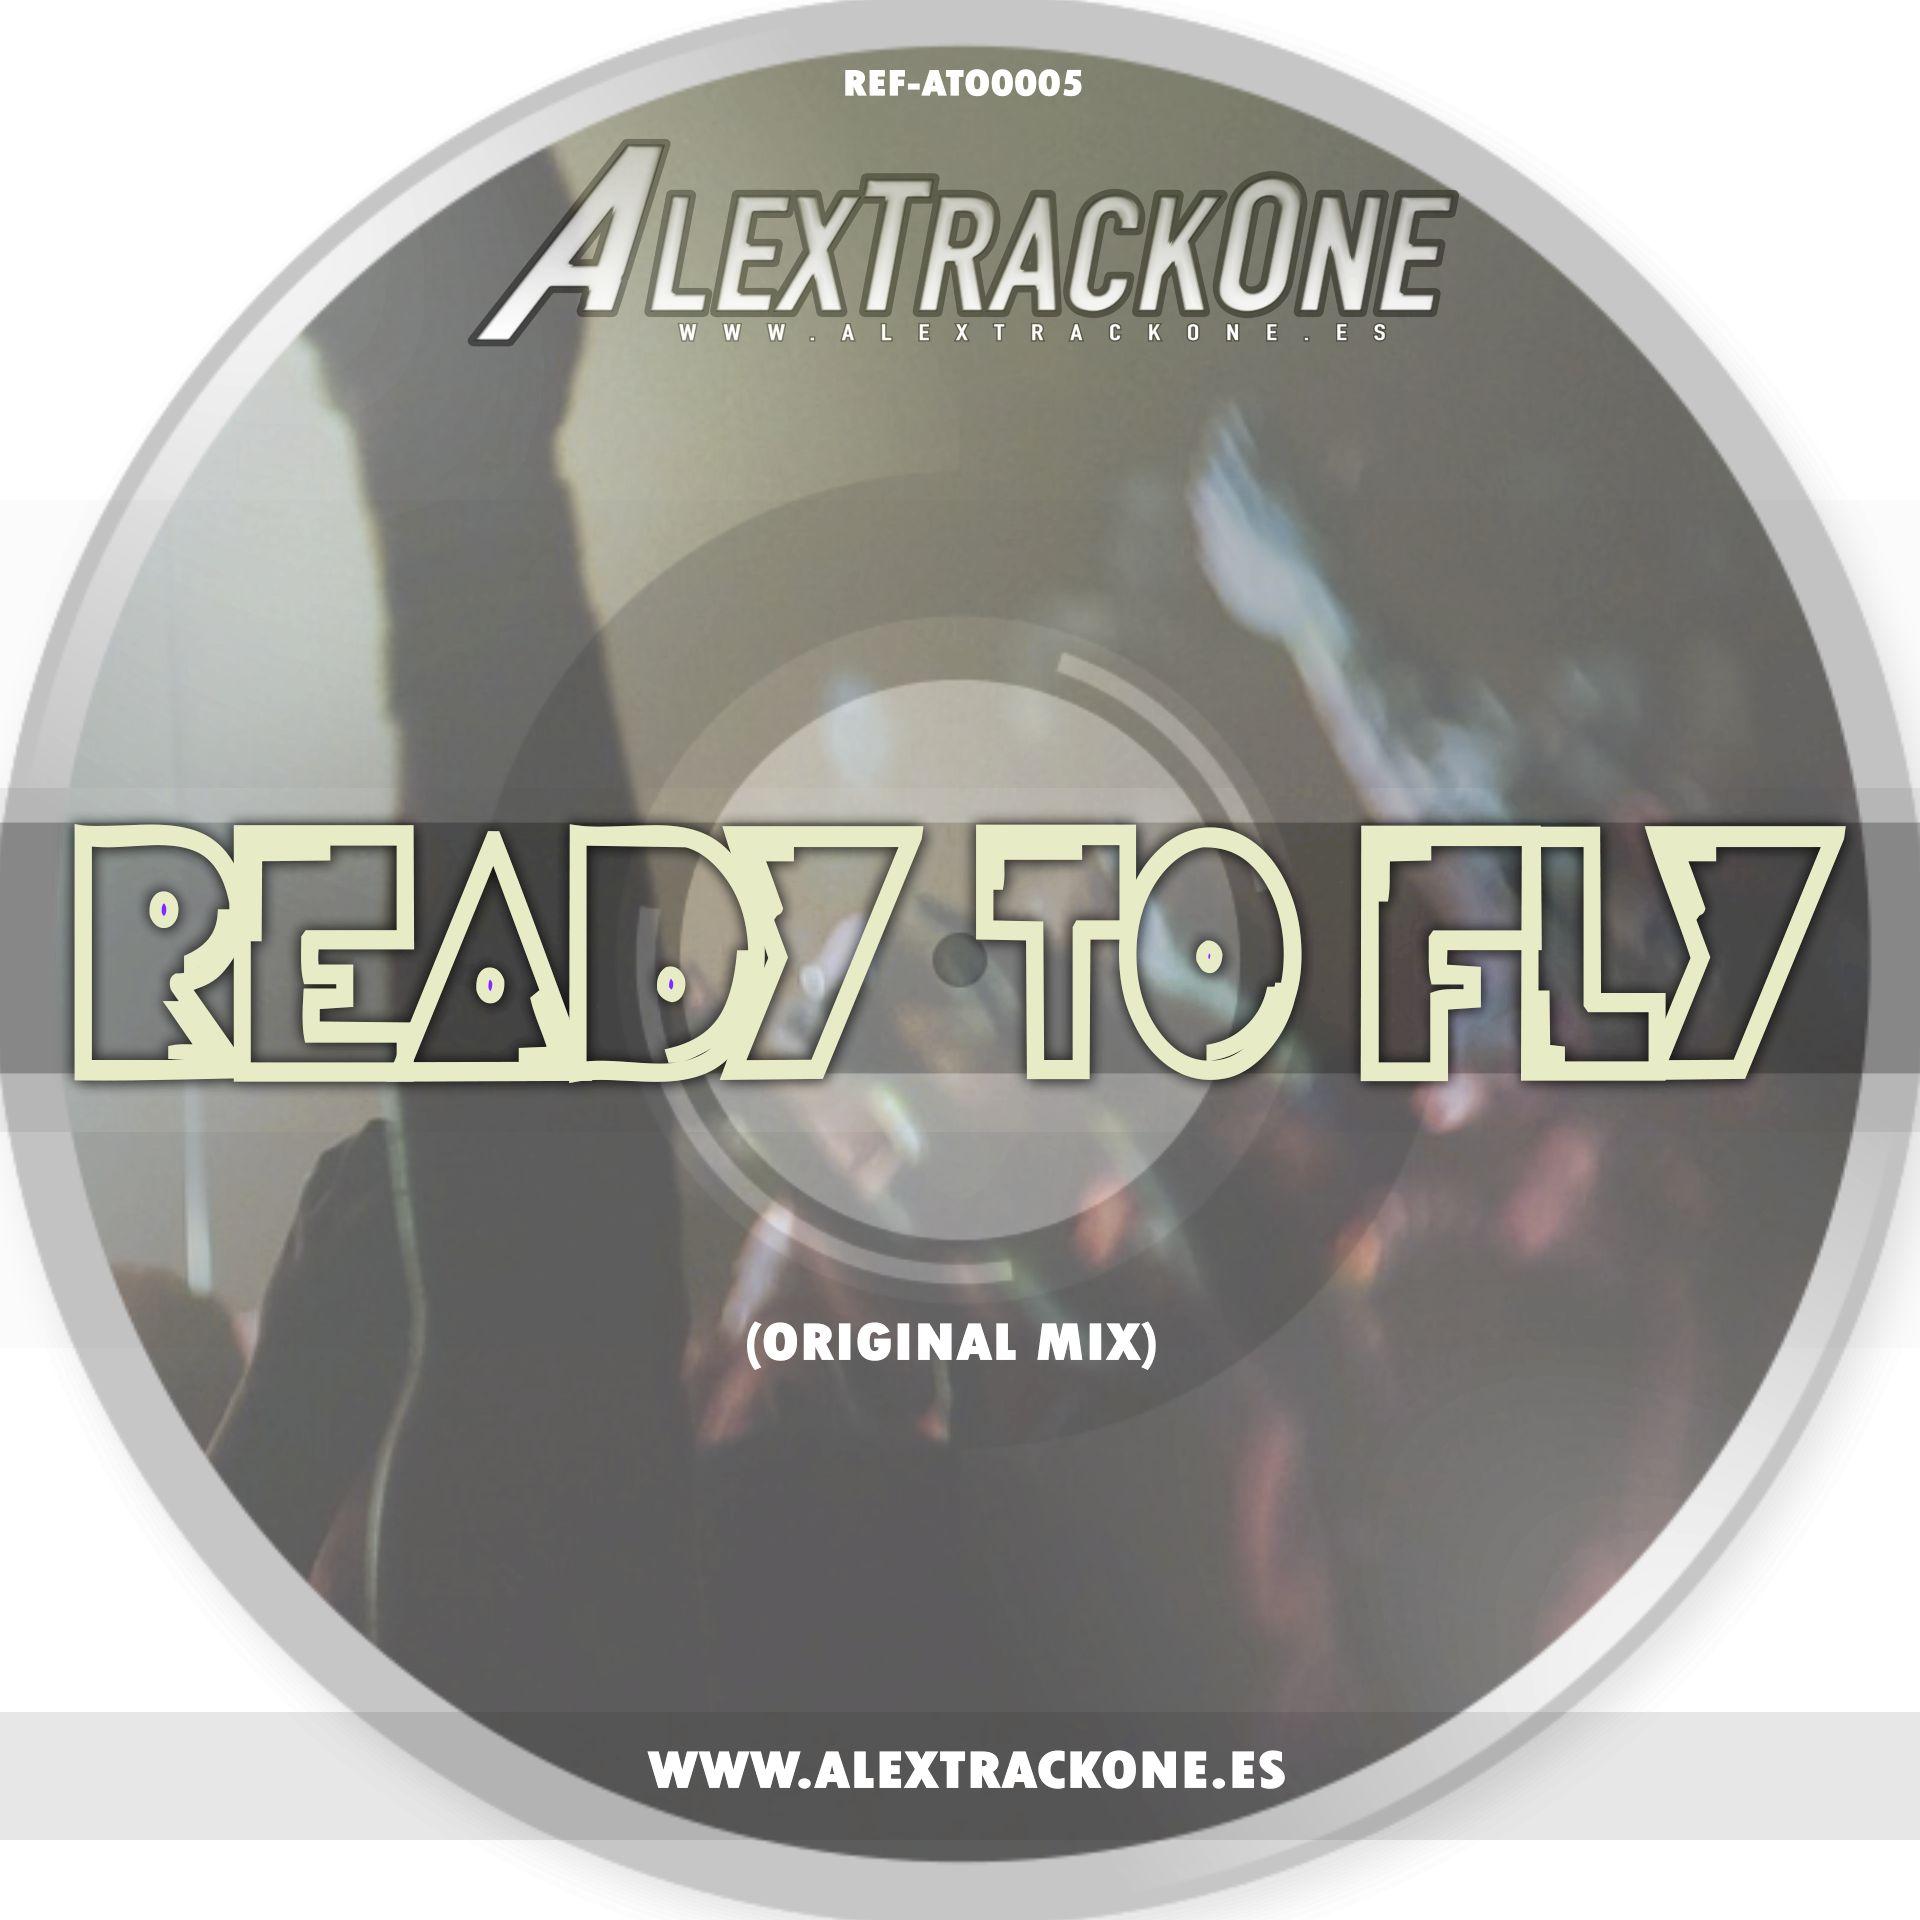 REF-ATO 0005 READY TO FLY (ORIGINAL MIX) (MP3 & WAV)